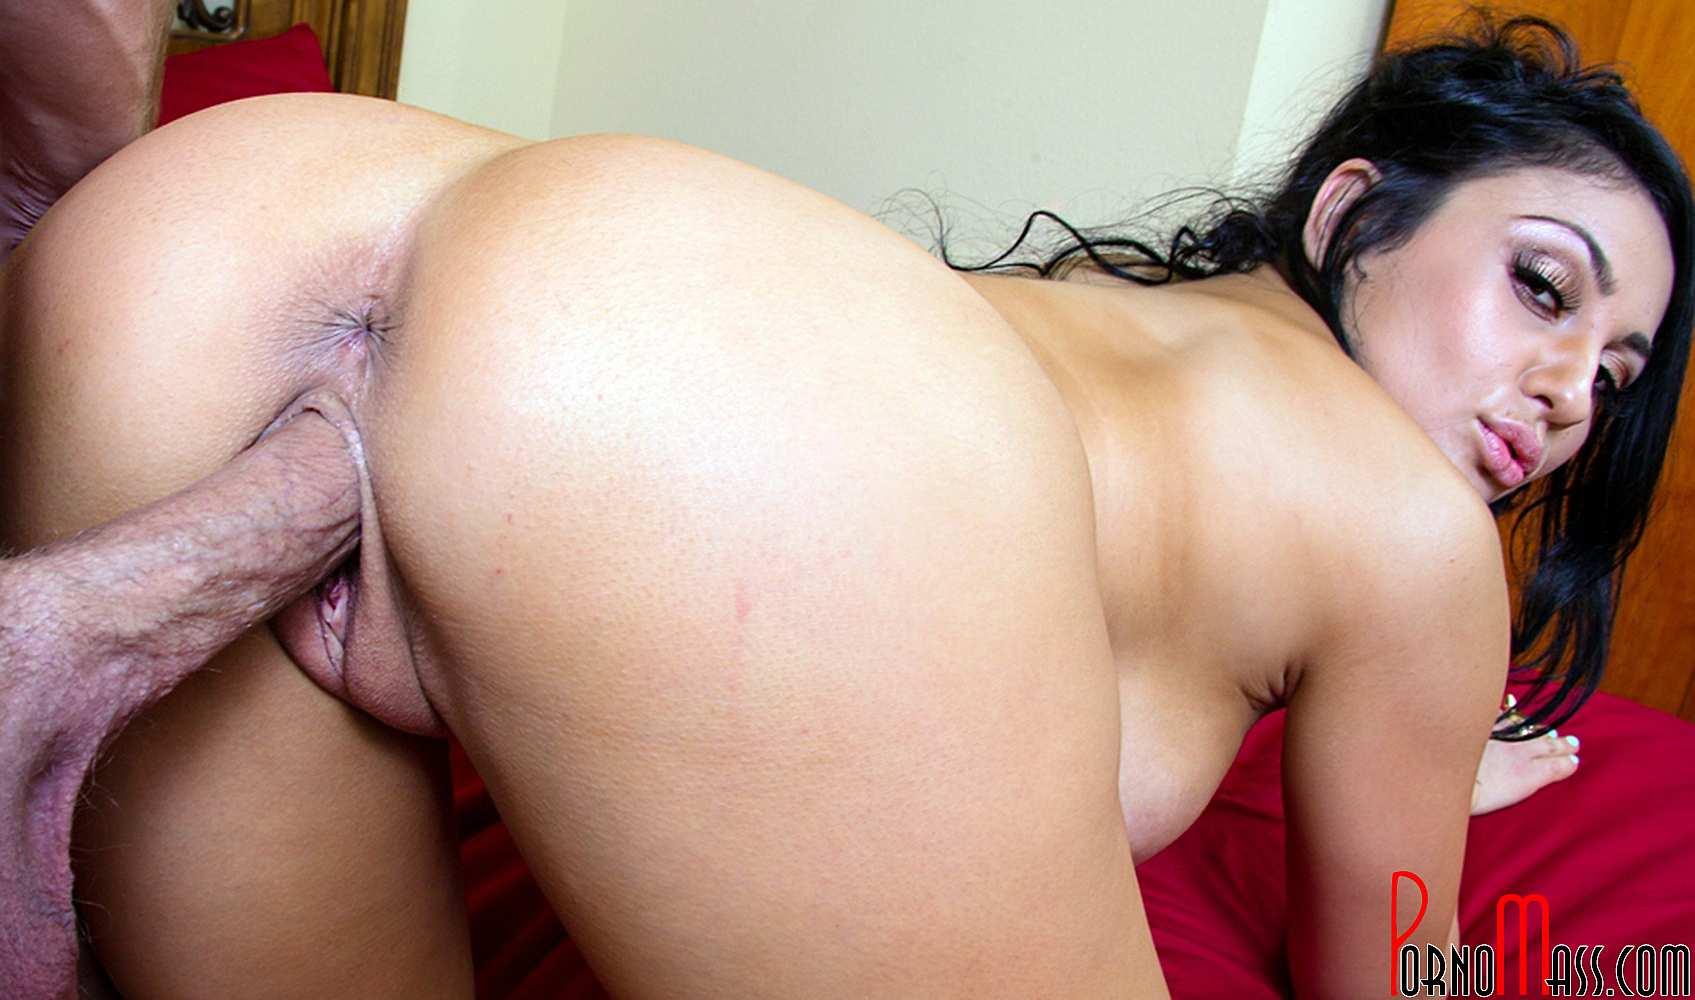 Nude photofuniya pics smut clip